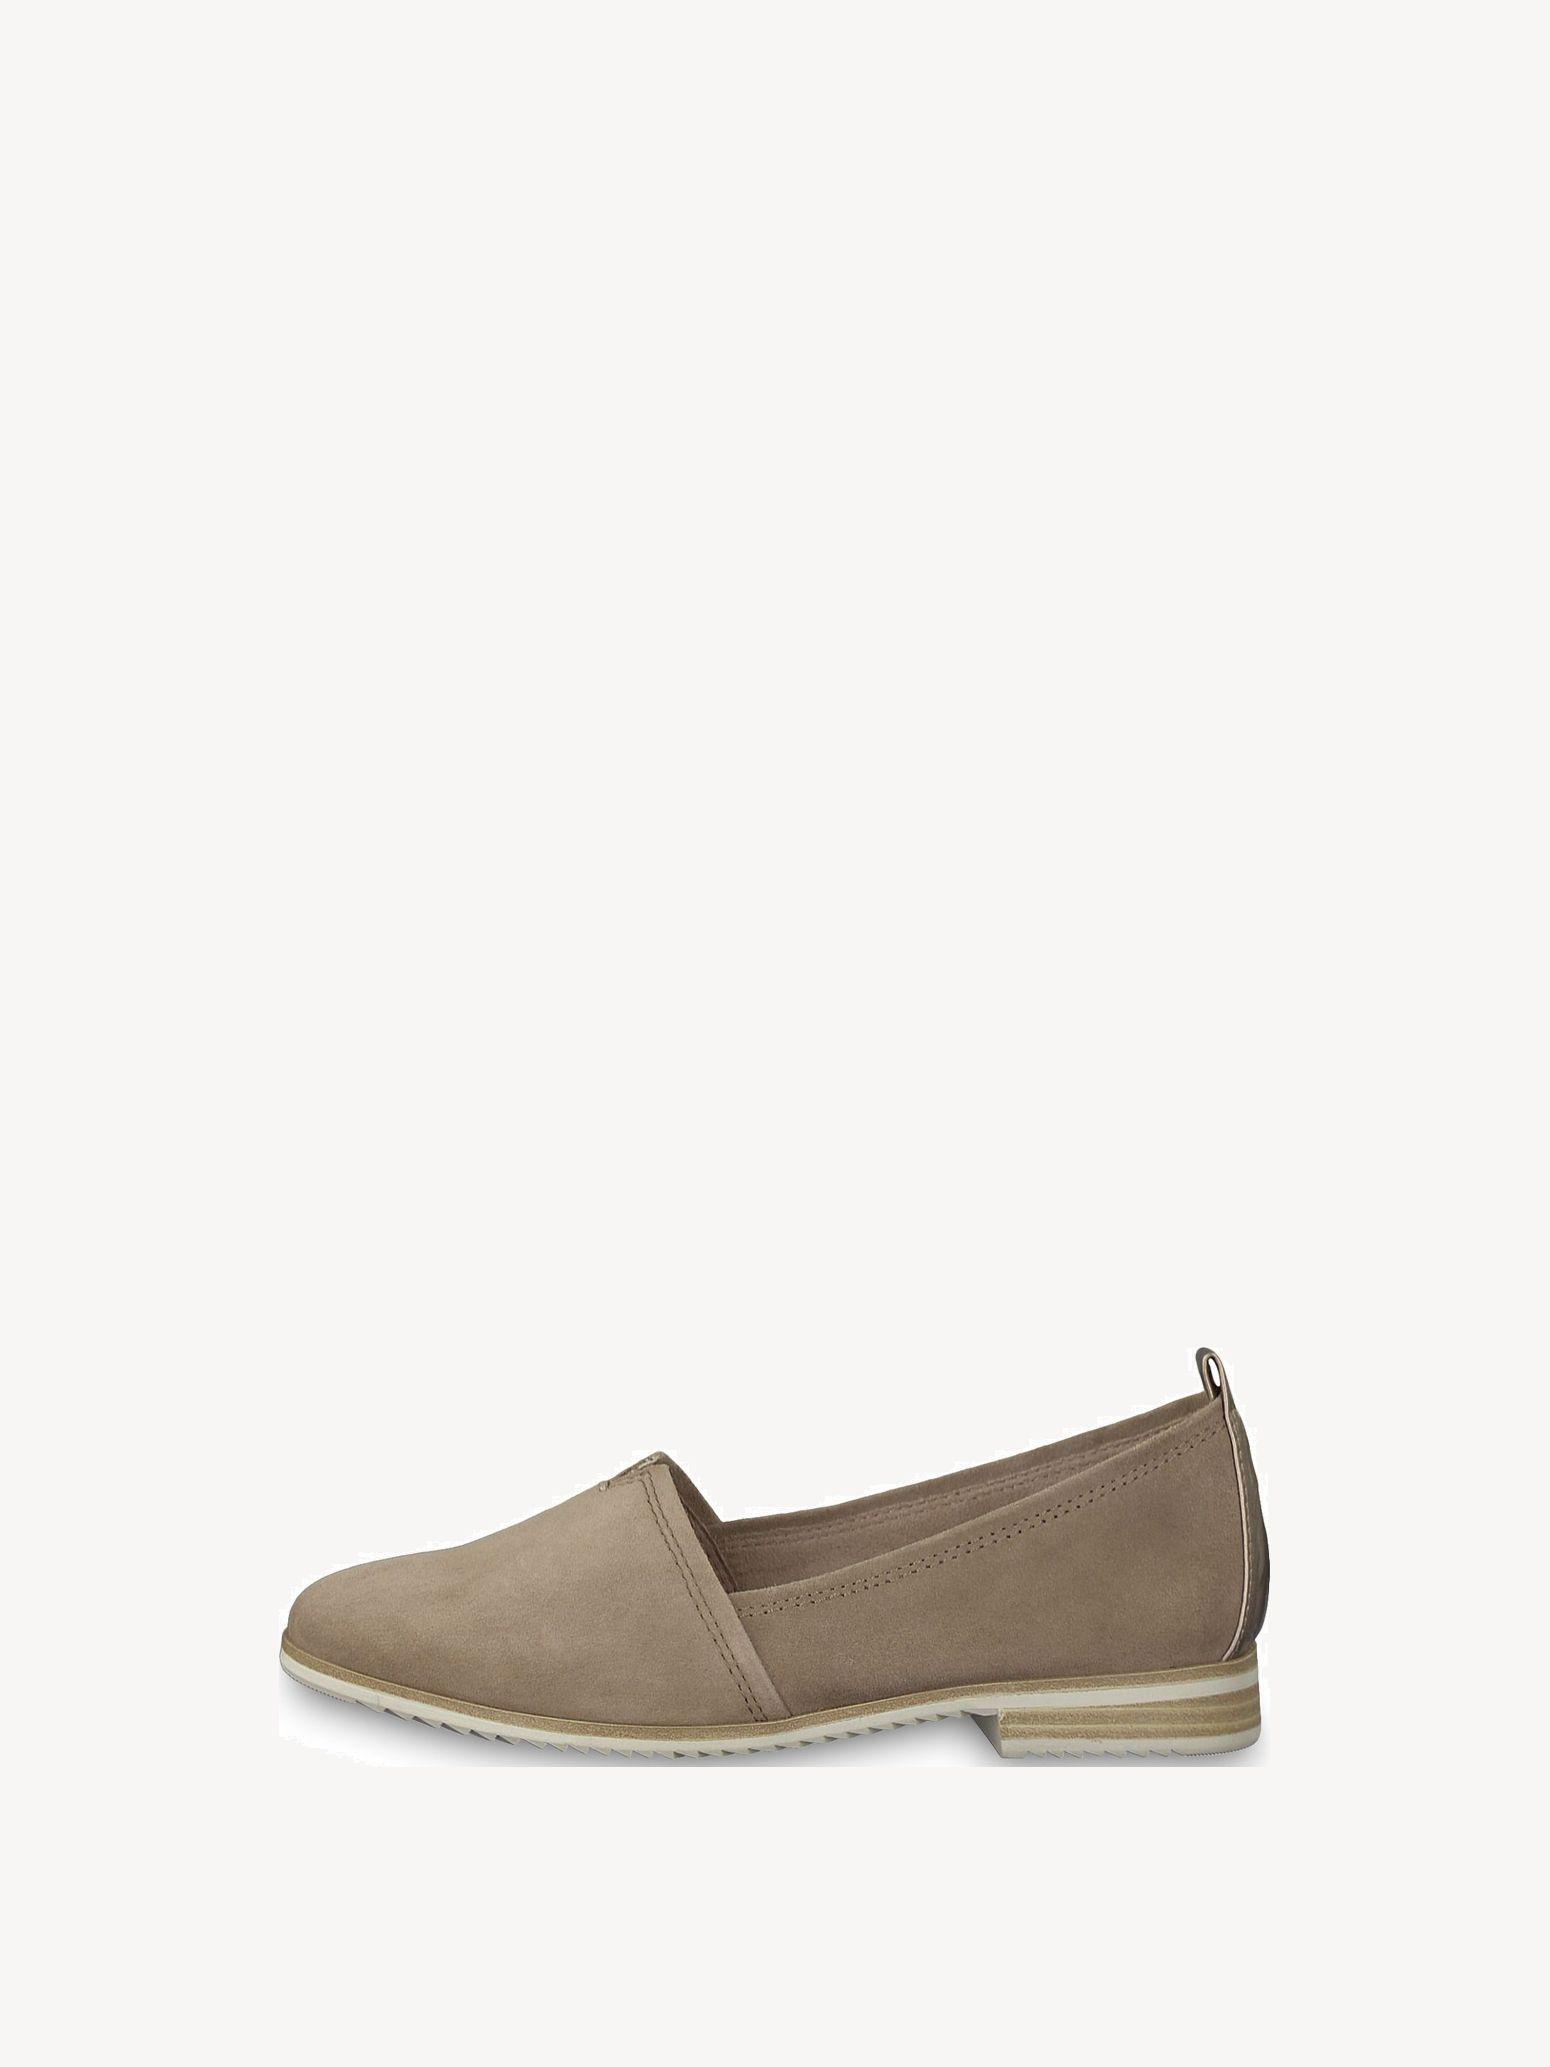 95fcb9592ca645 Pistil 1-1-24205-20  Buy Tamaris Slippers online!